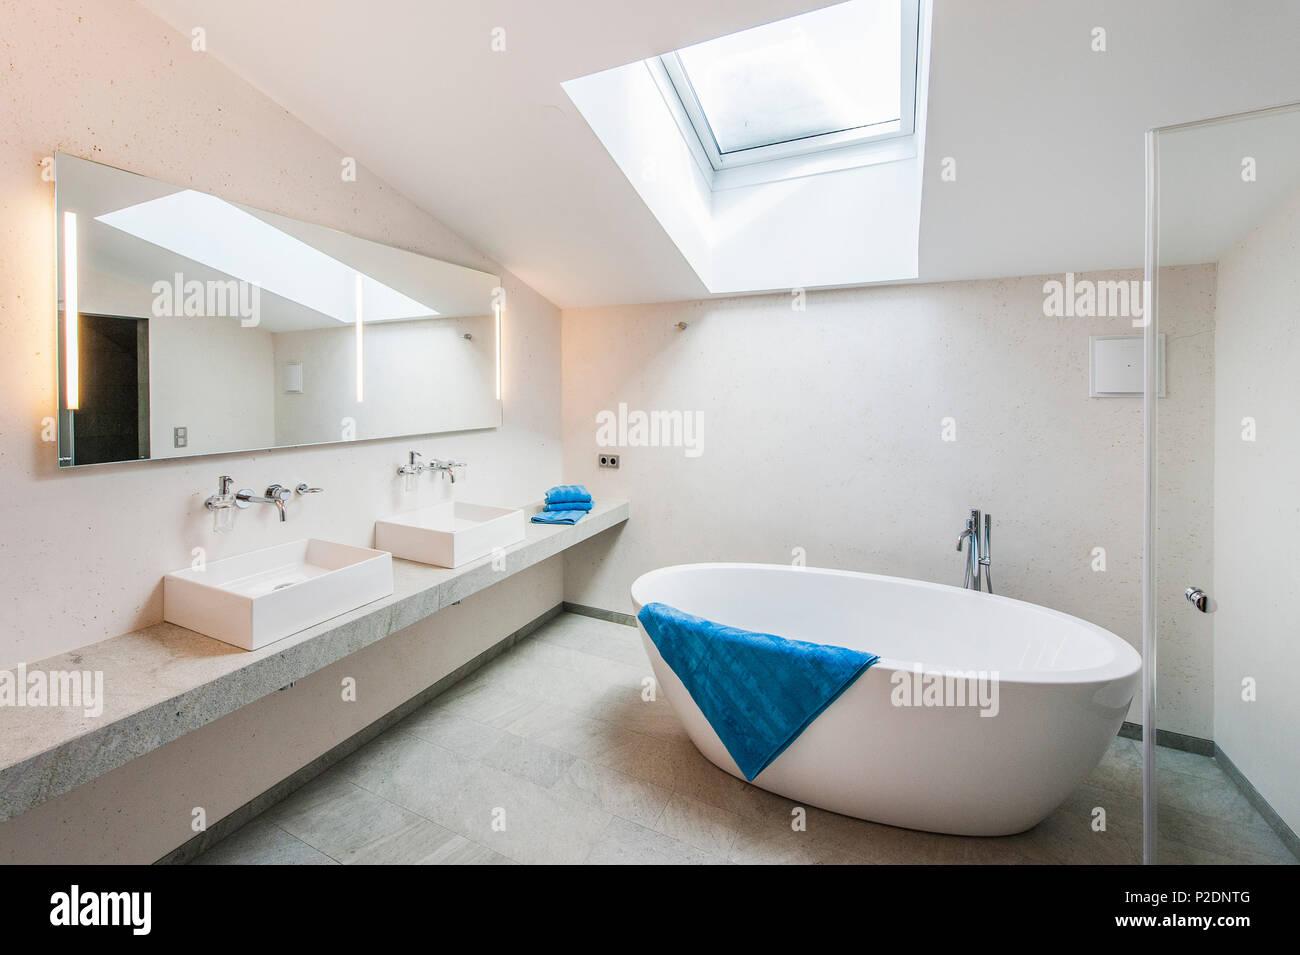 Bathroom in a penthouse in a modern alpine style, Kitzbuehel, Tyrol, Austria, Europe - Stock Image